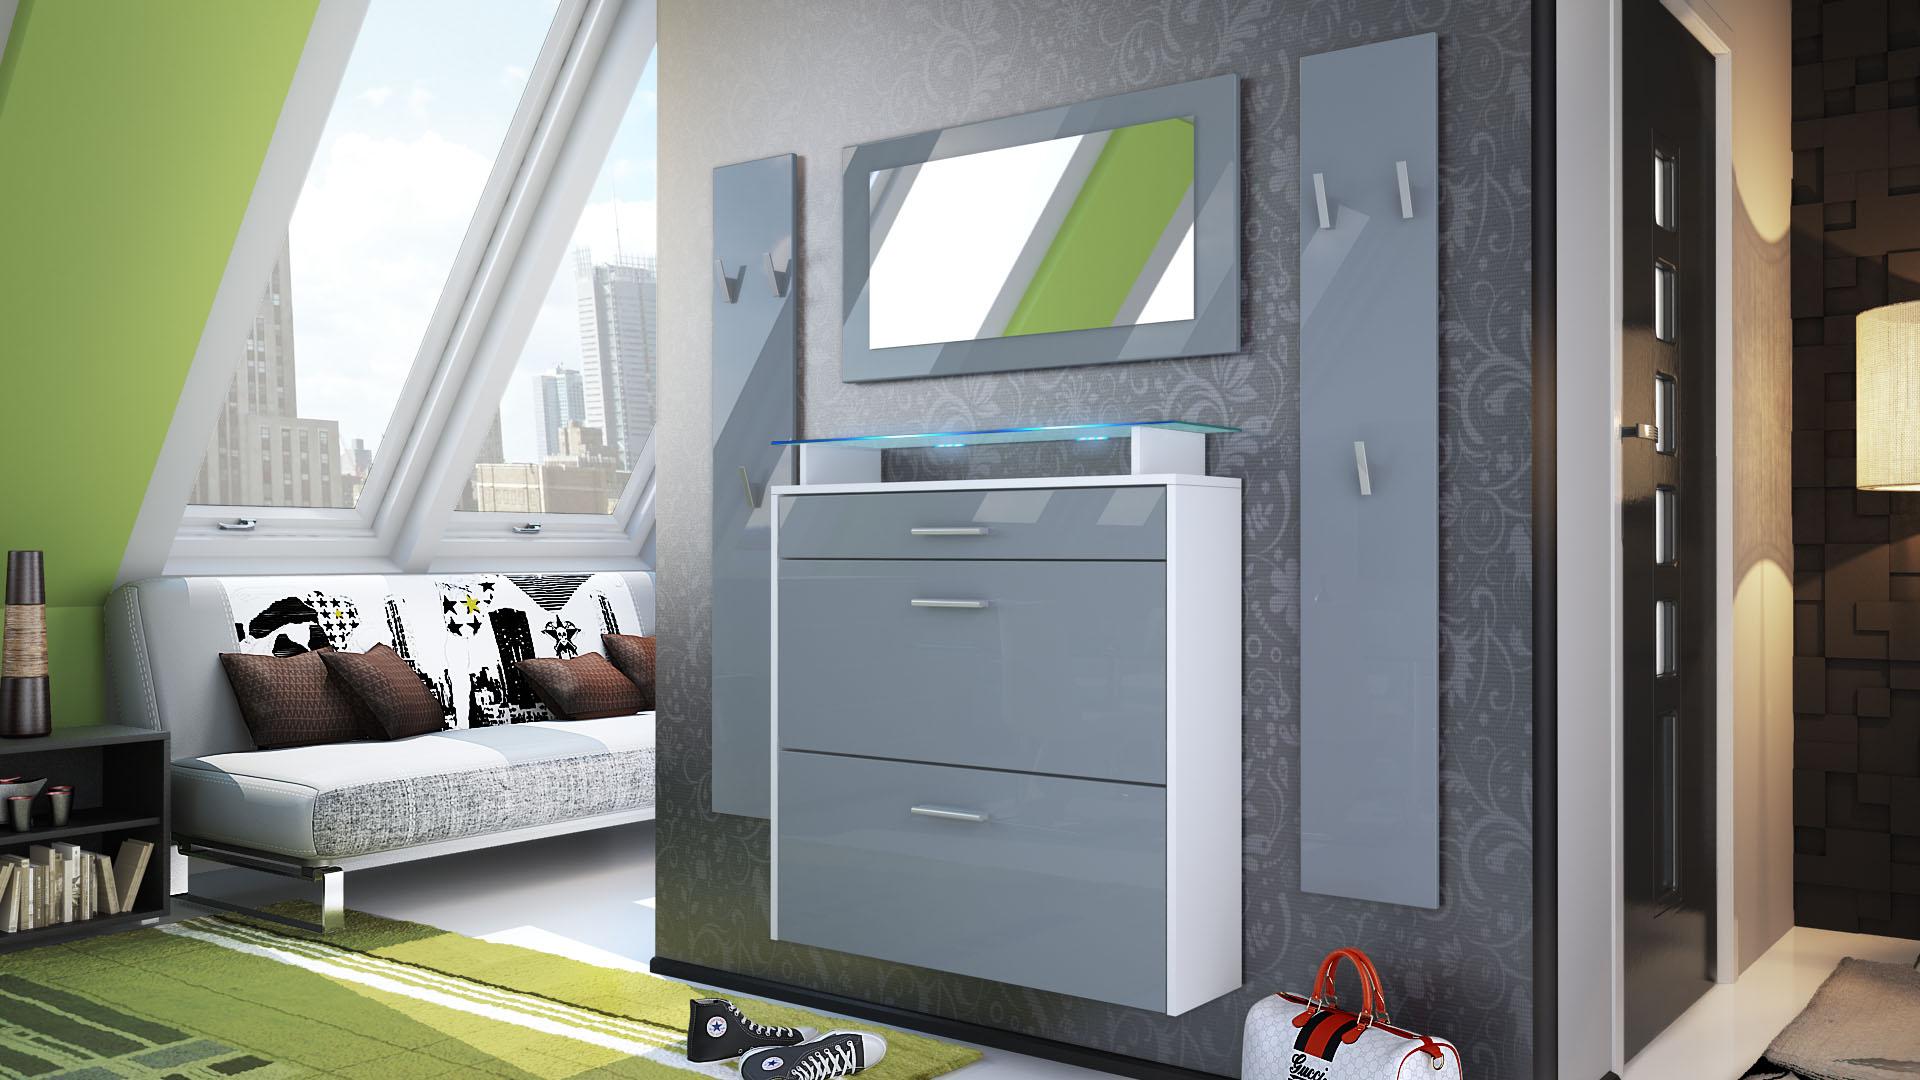 garderobenset flur garderobe diele set malea wei spiegel. Black Bedroom Furniture Sets. Home Design Ideas